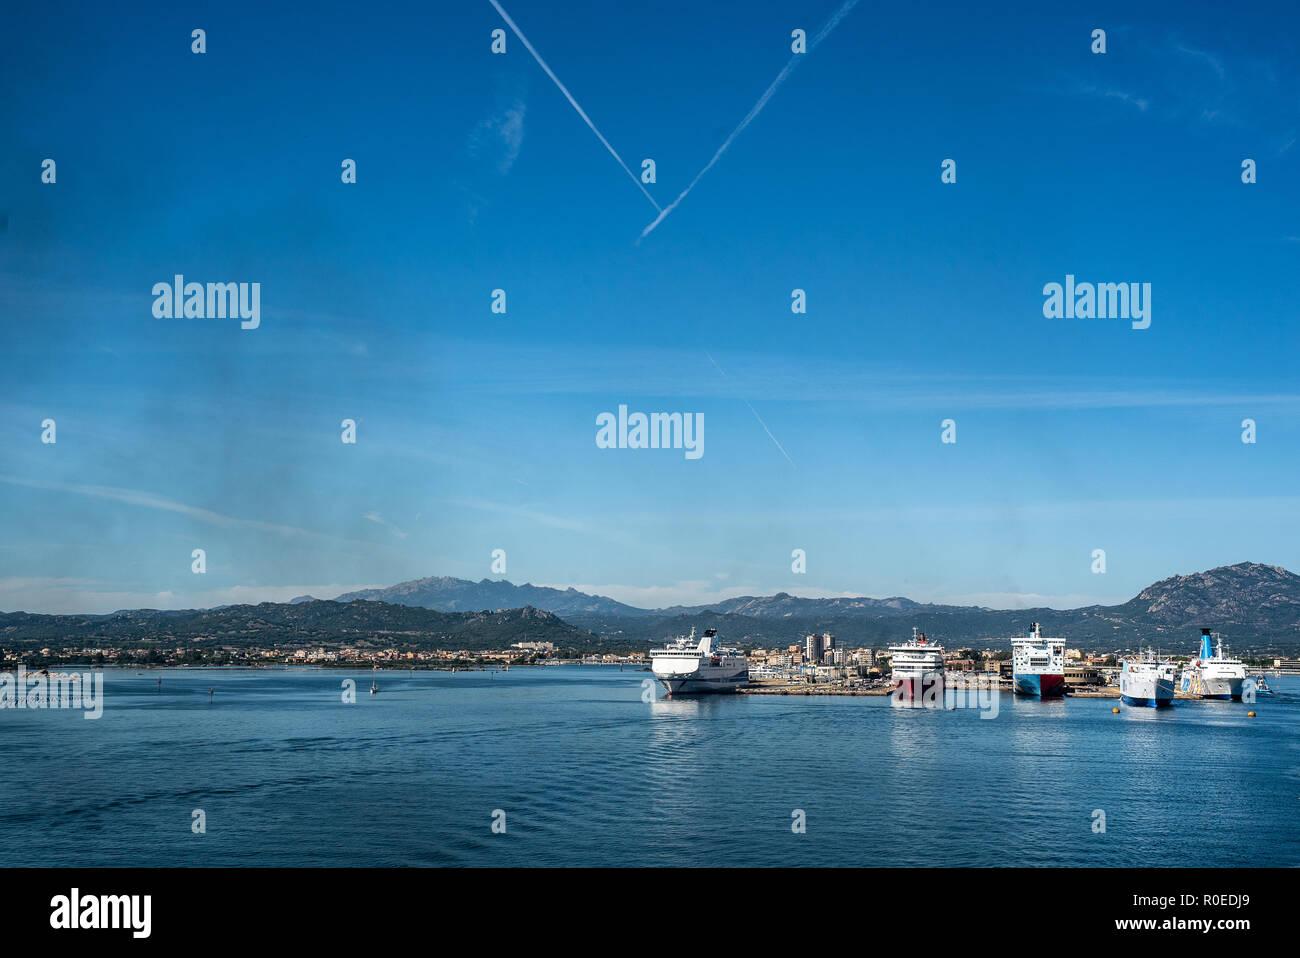 OLBIA, ITALY Ferry Sky Island Harbour - Stock Image